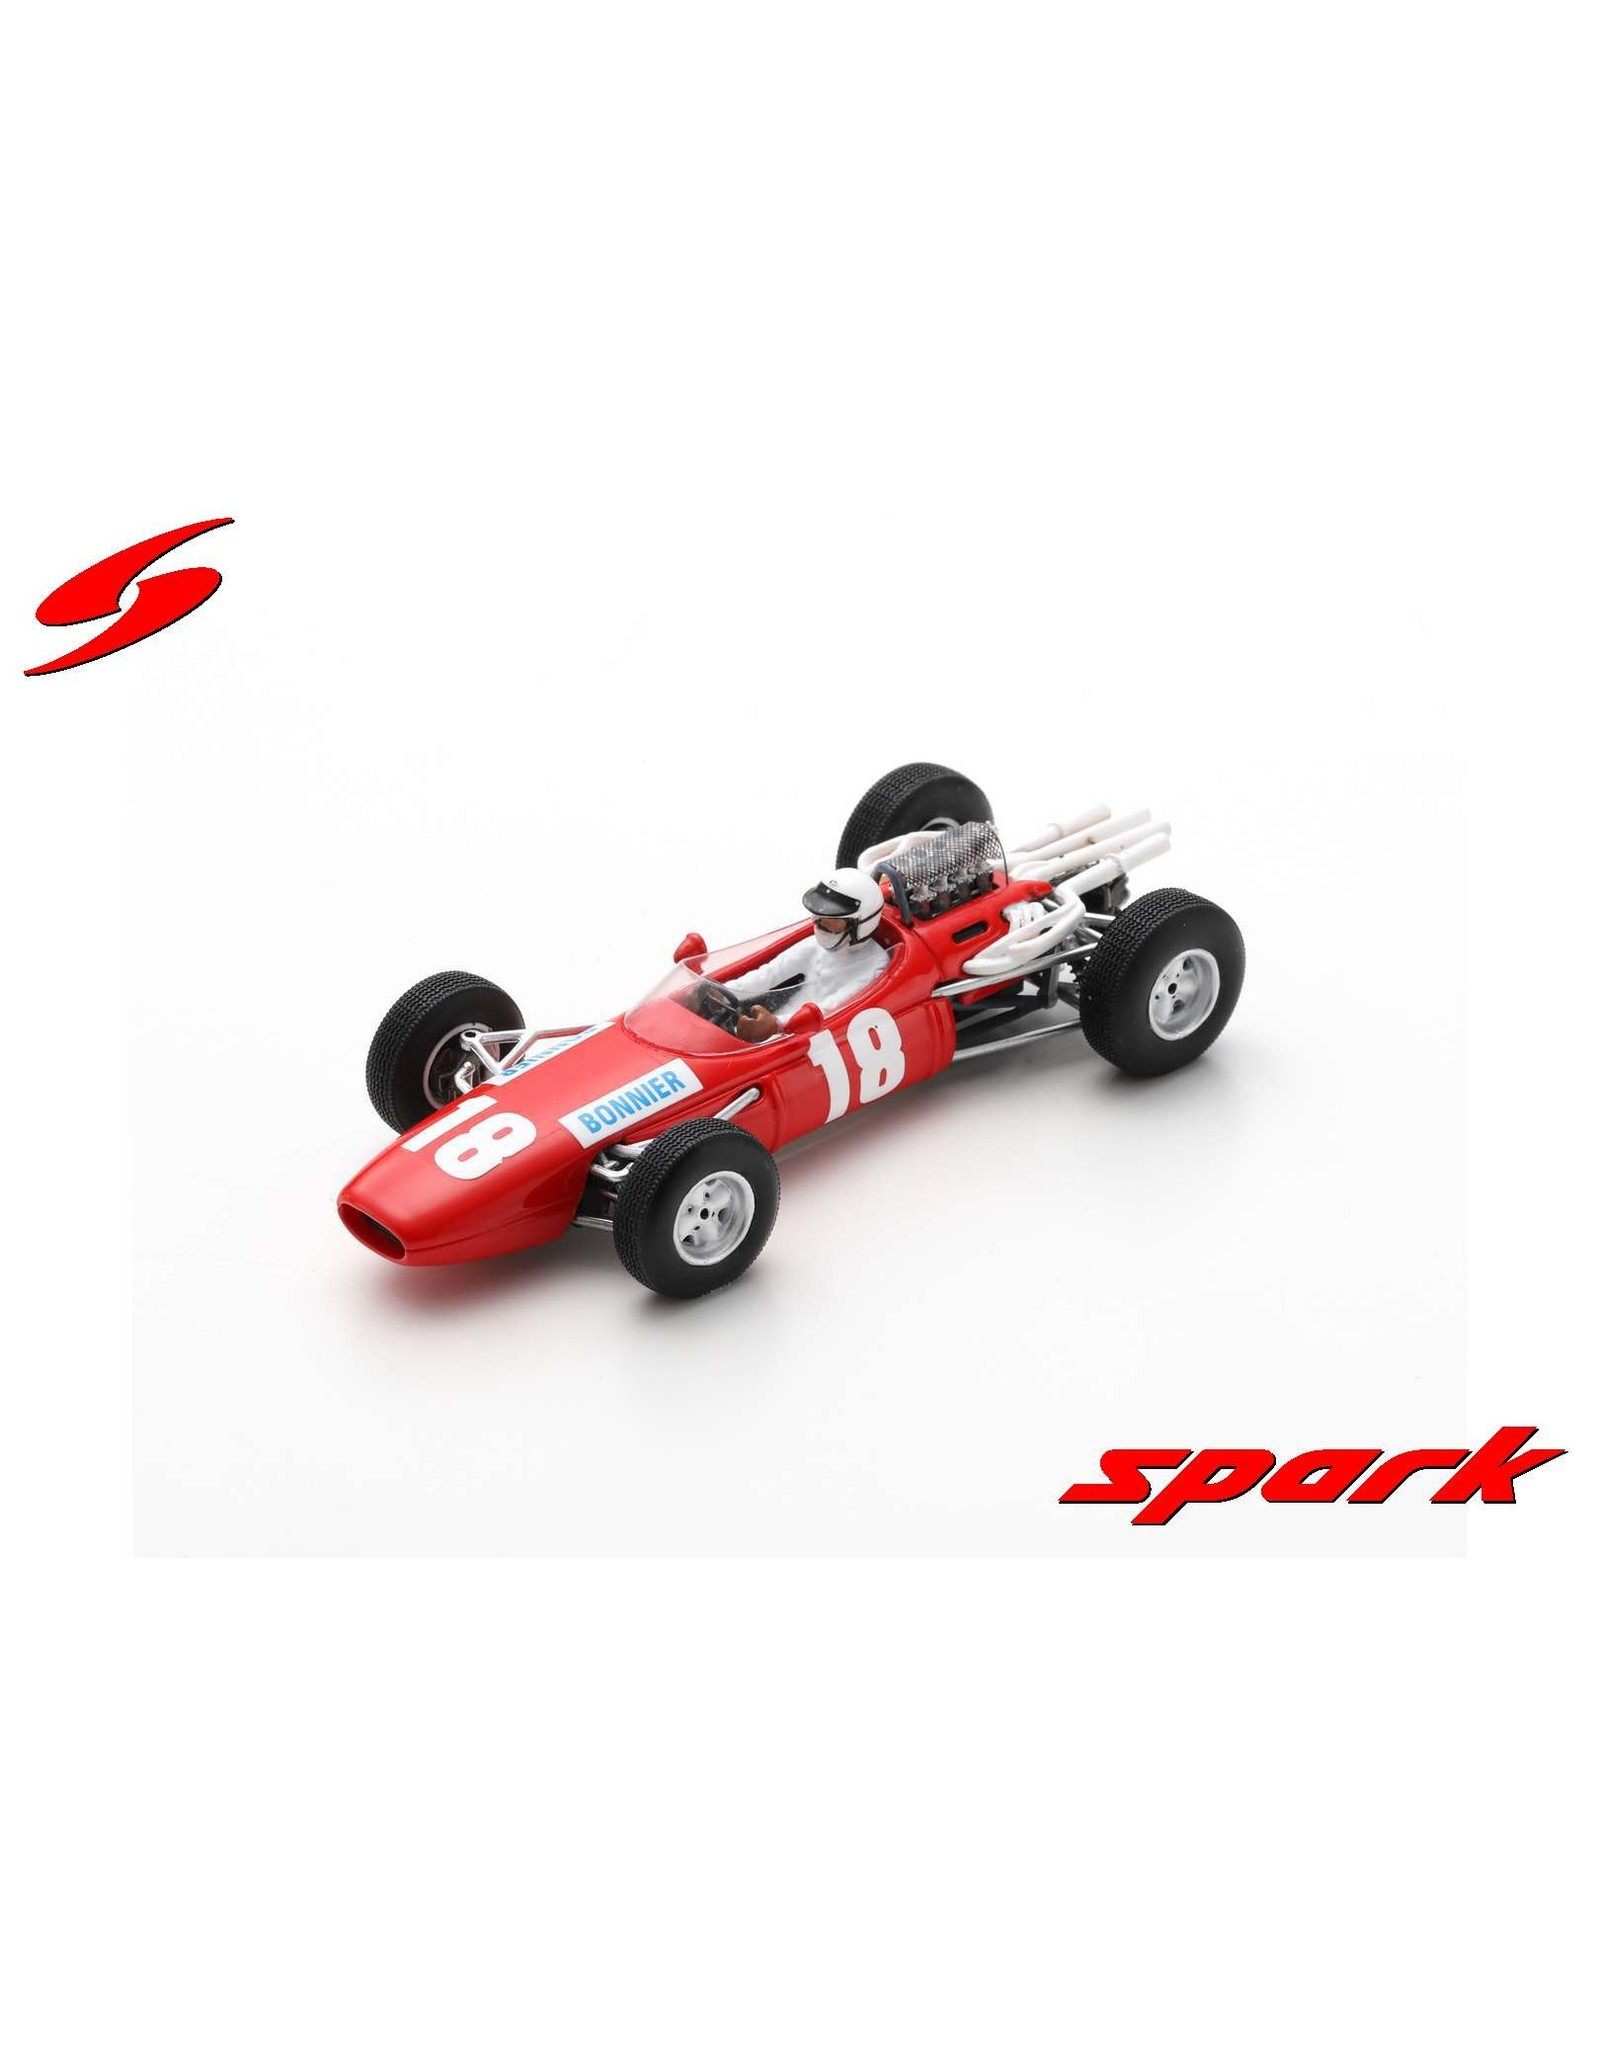 Formule 1 Formule 1 Brabham BT7 #18 GP United Kingdom 1966 - 1:43 - Spark